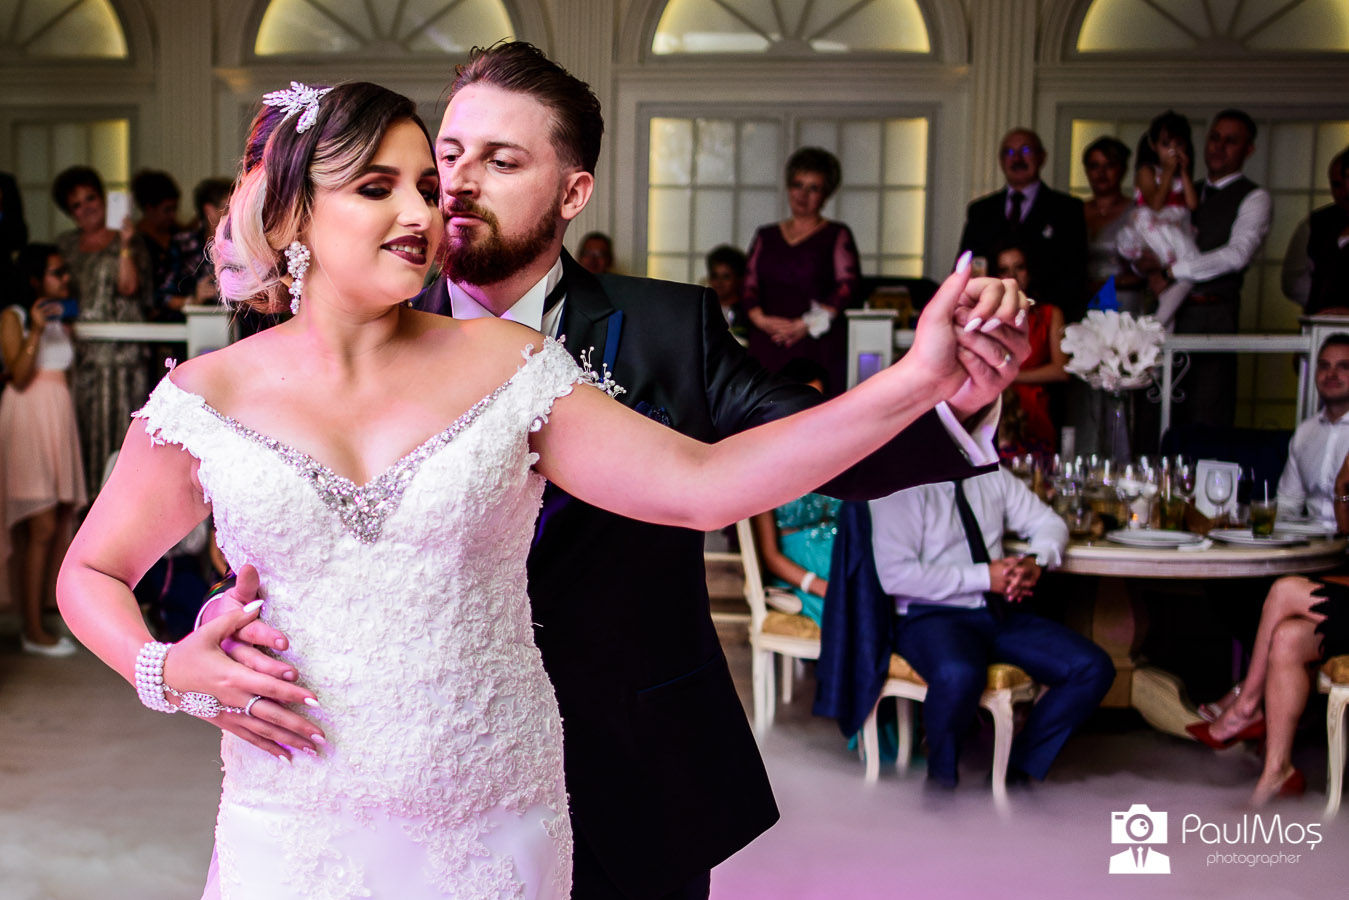 foto-video nunta, nunti arad, furnizori servicii foto-video nunta arad